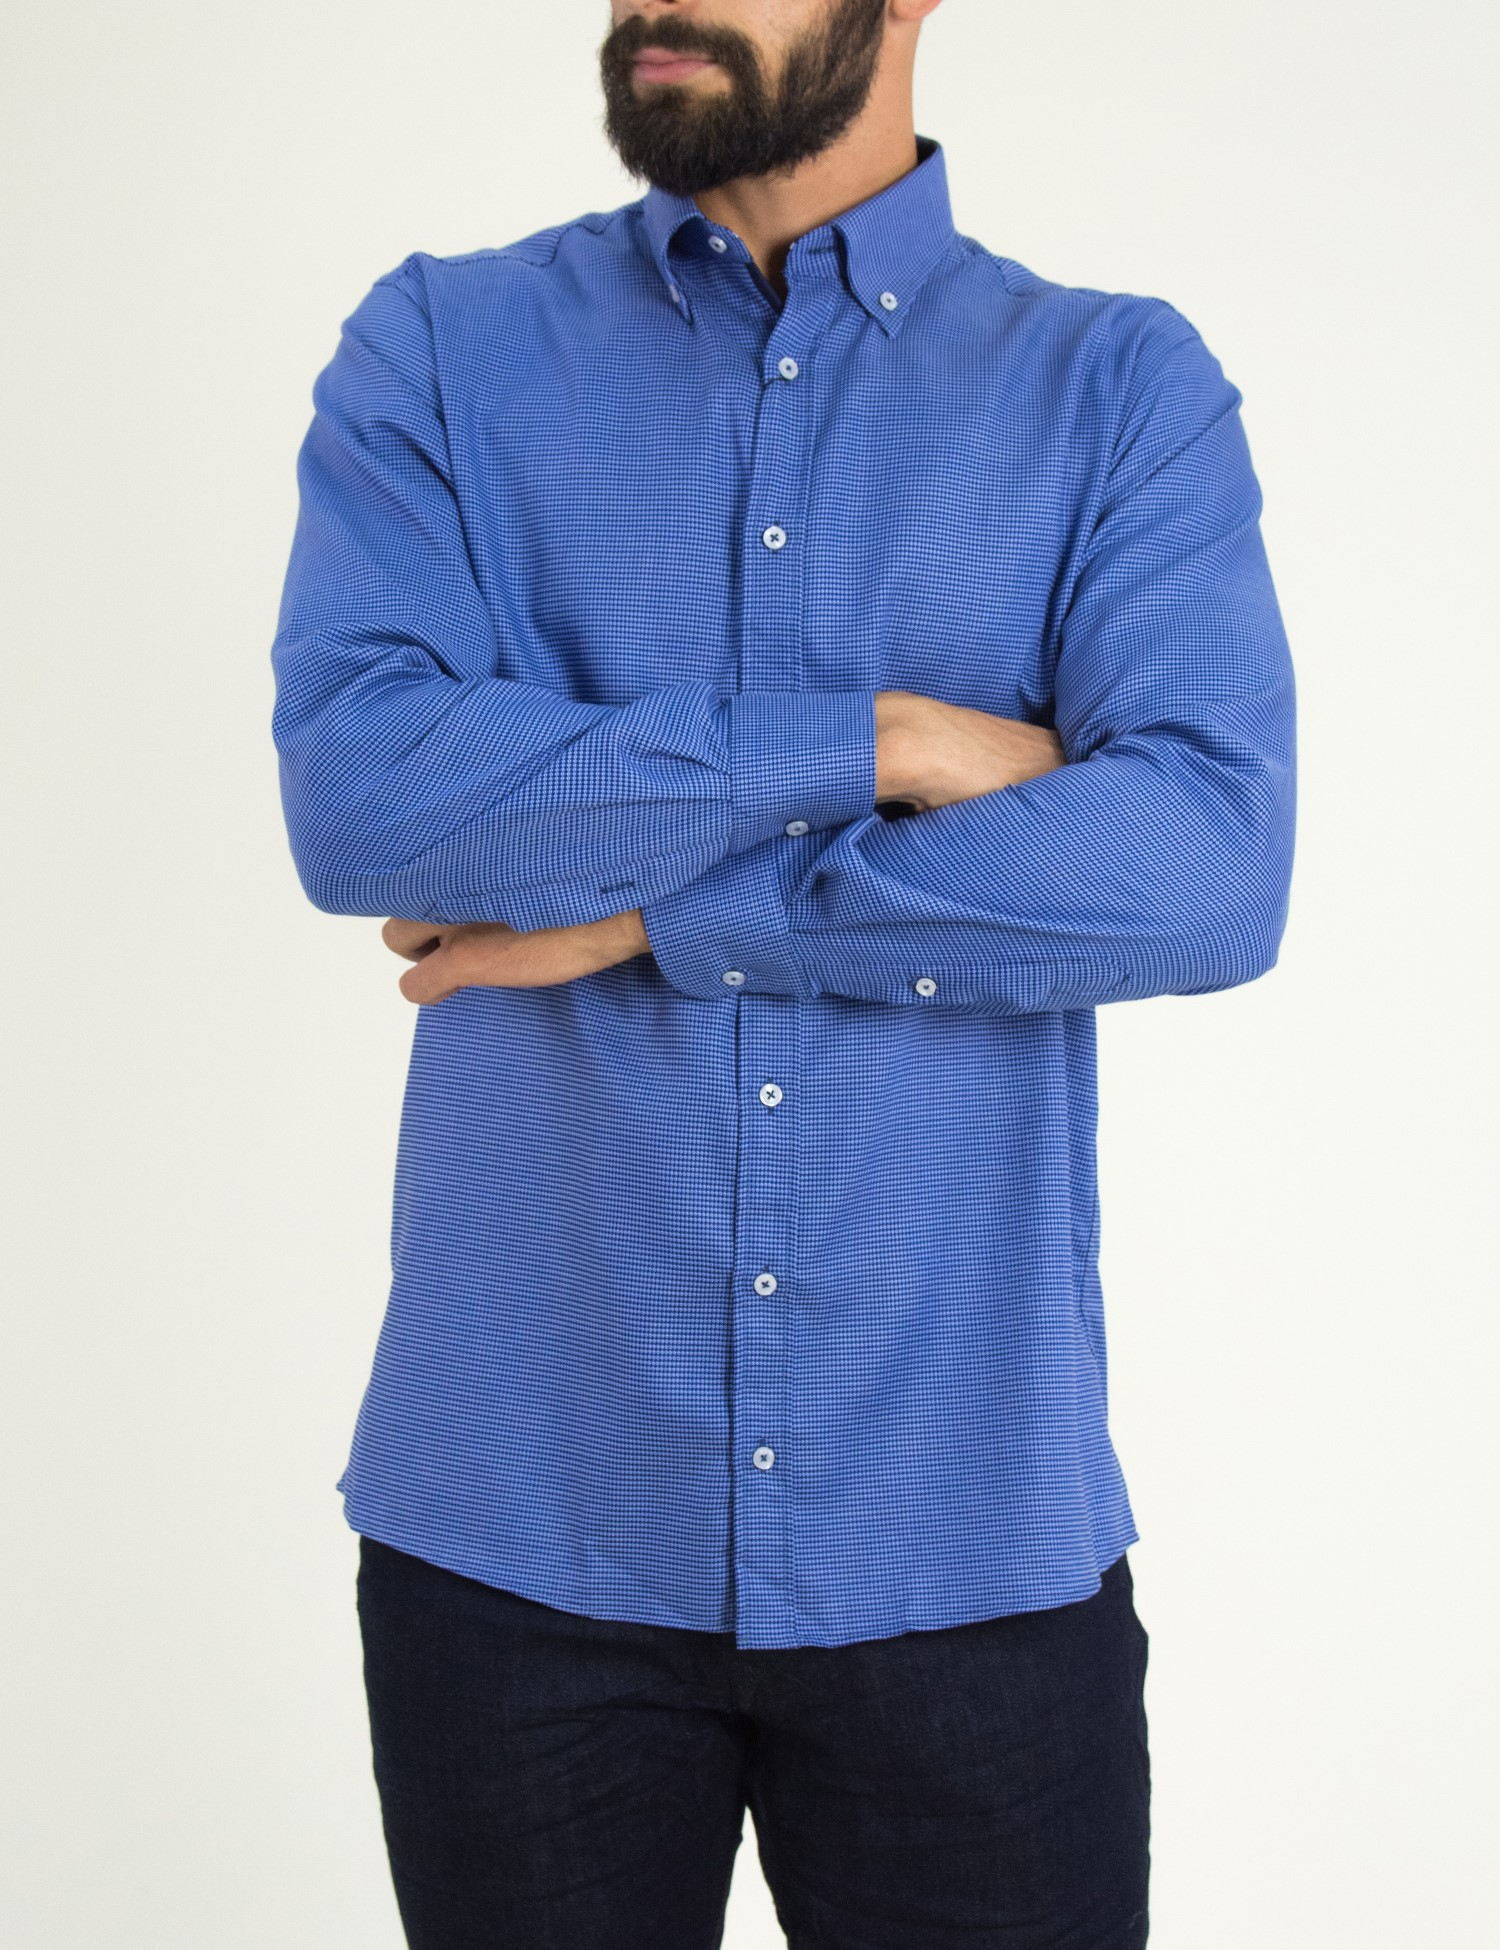 d7a6f565e356 Ανδρικό μπλέ πουκάμισο με μικροσχέδια Truzi 01912093